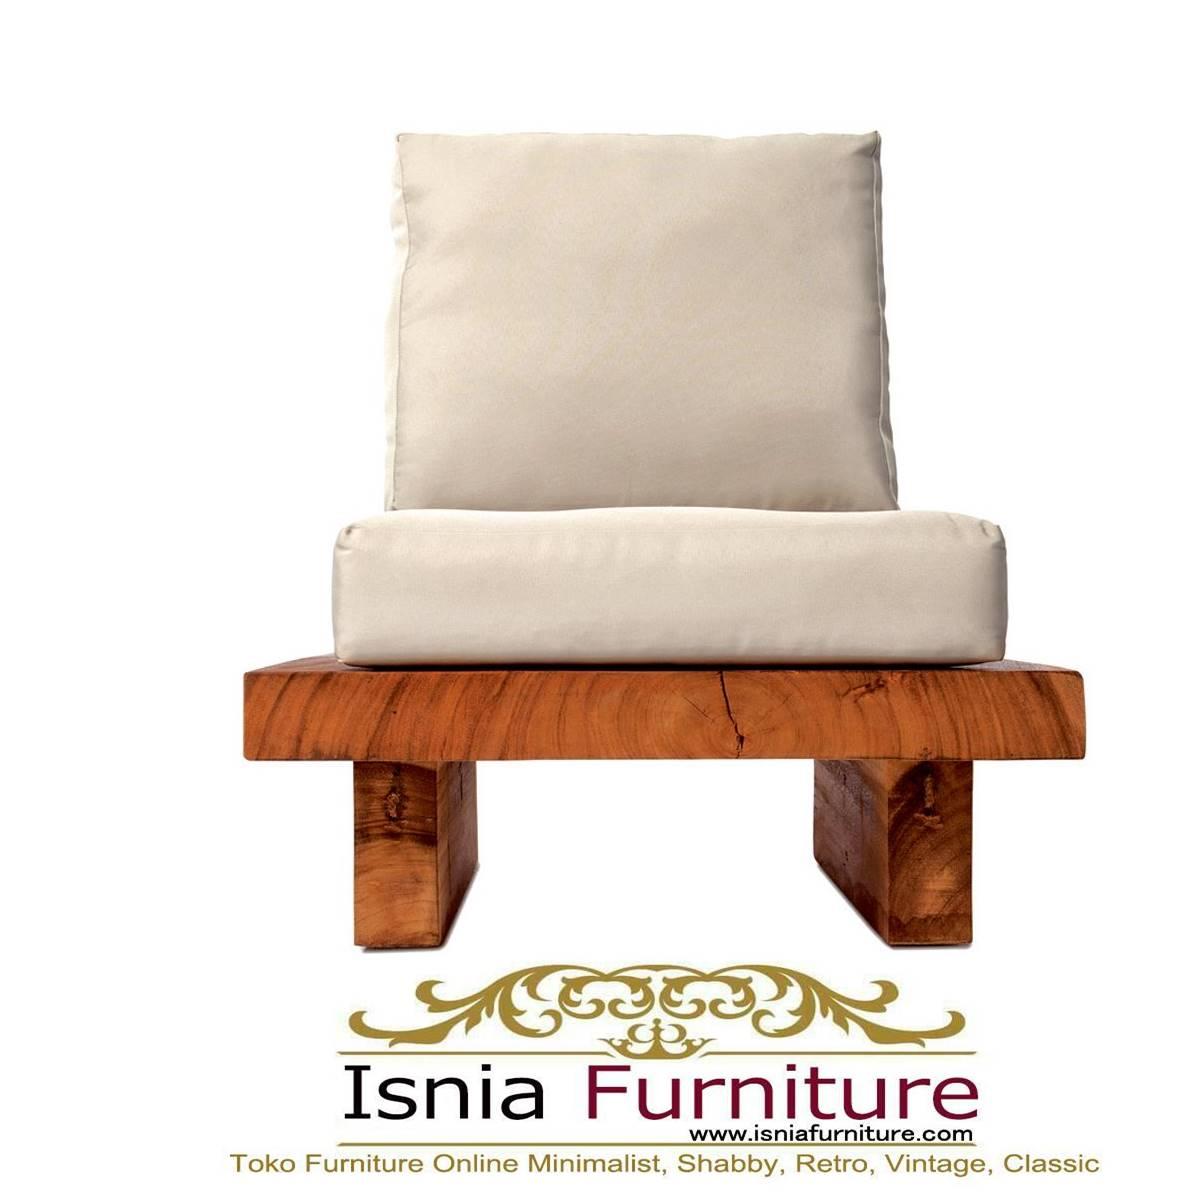 kursi-tamu-kayu-trembesi Jual Kursi Tamu sofa Trembesi Modern